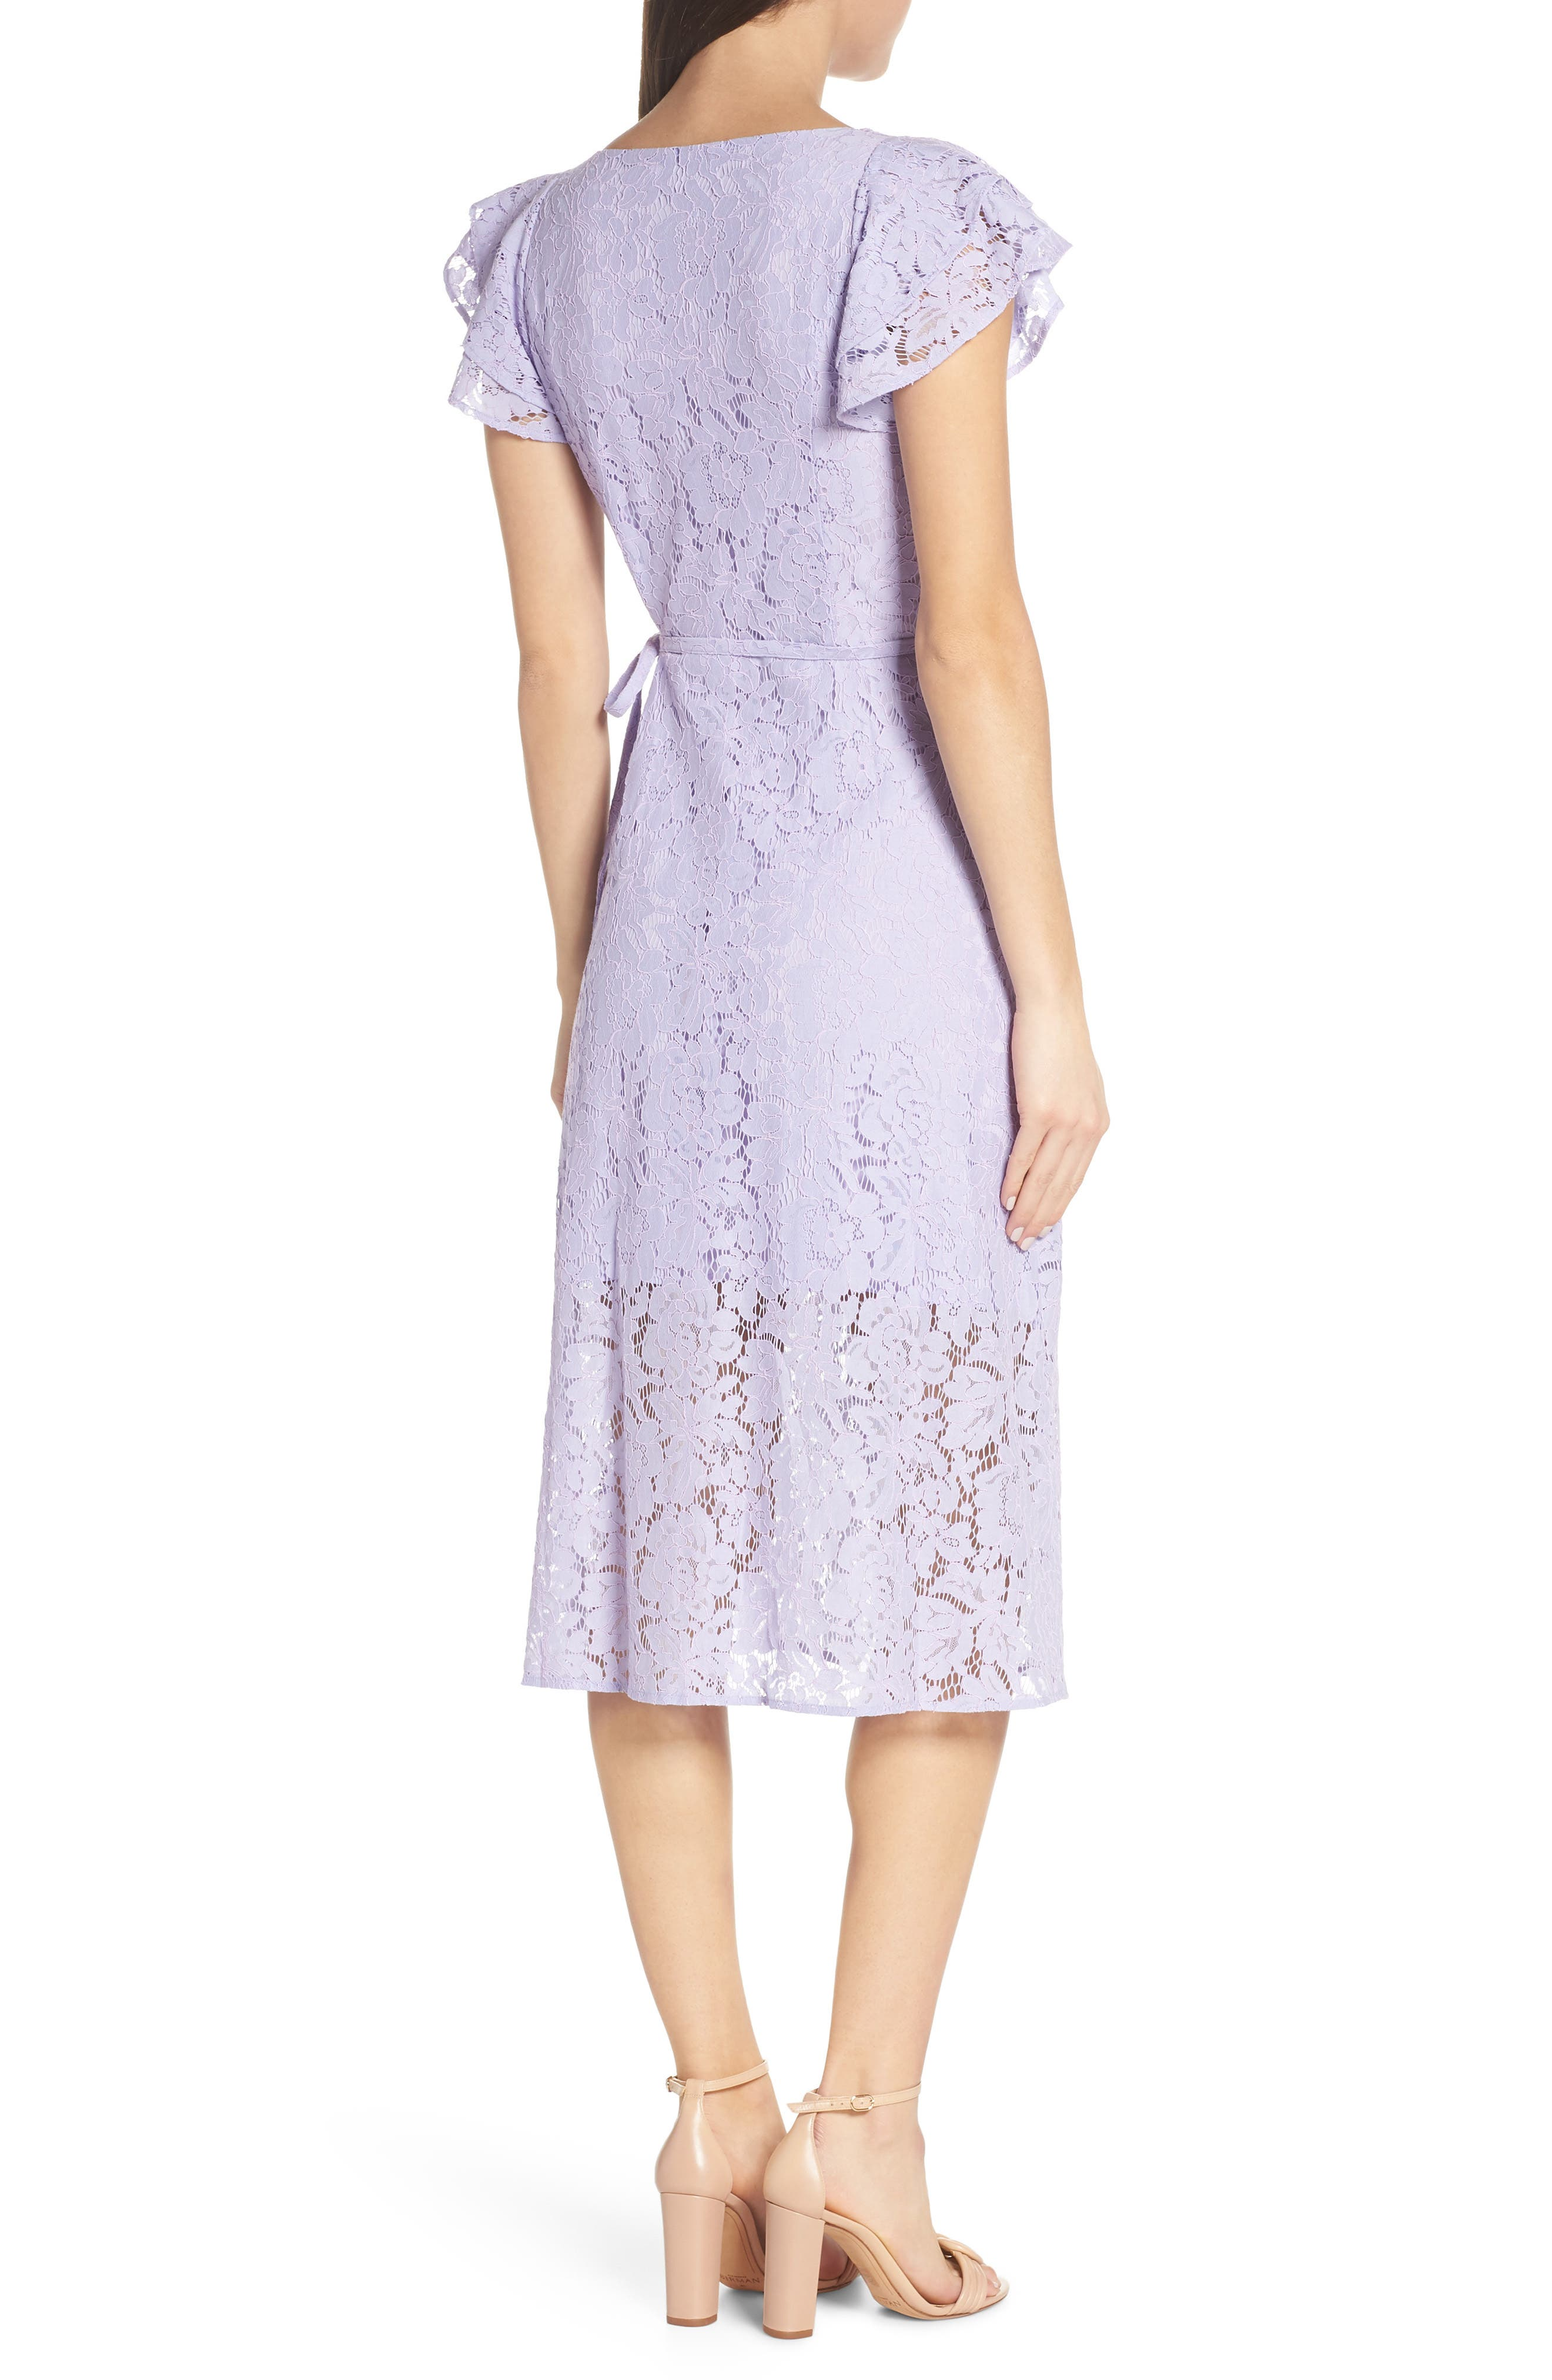 ALI & JAY, Ruffle Sleeve Wrap Lace Midi Dress, Alternate thumbnail 2, color, LAVENDER